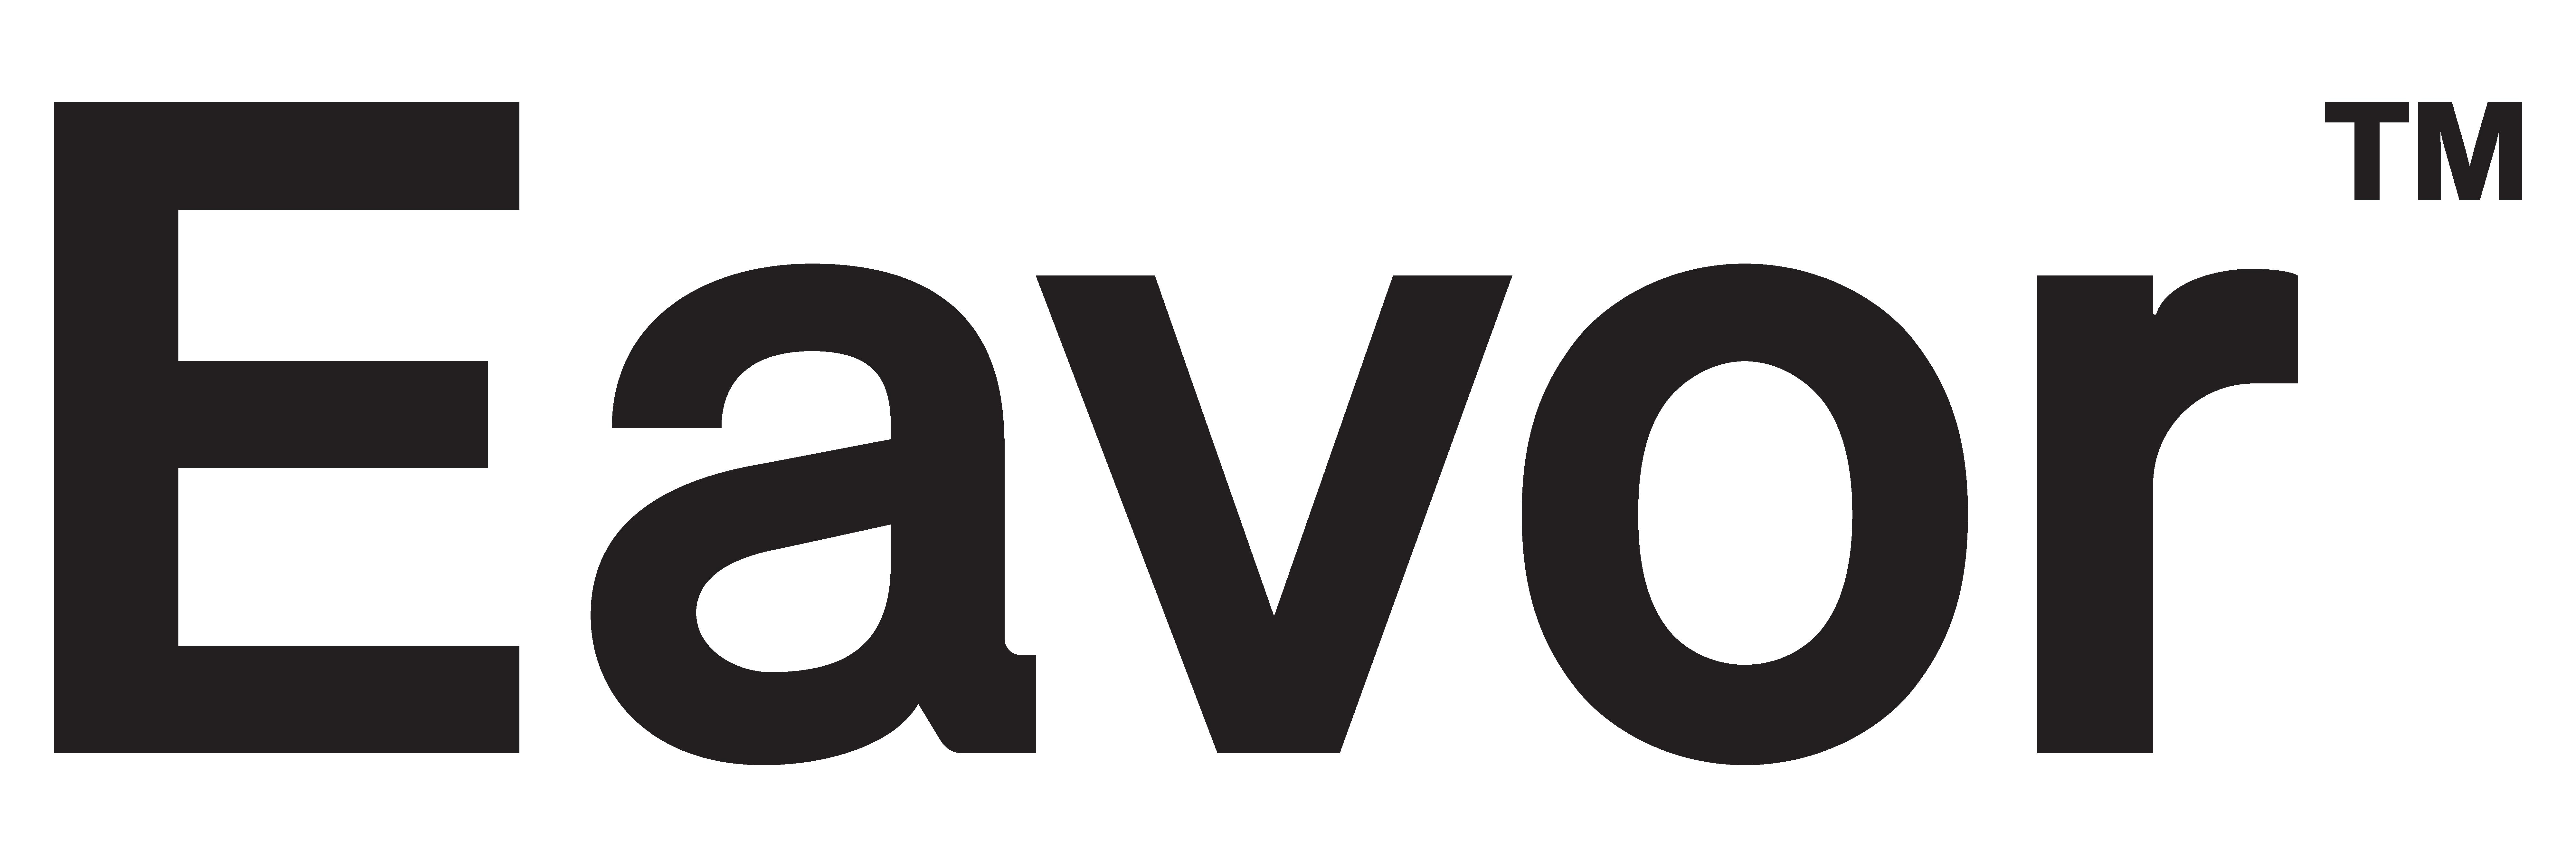 Eavor Announces $11